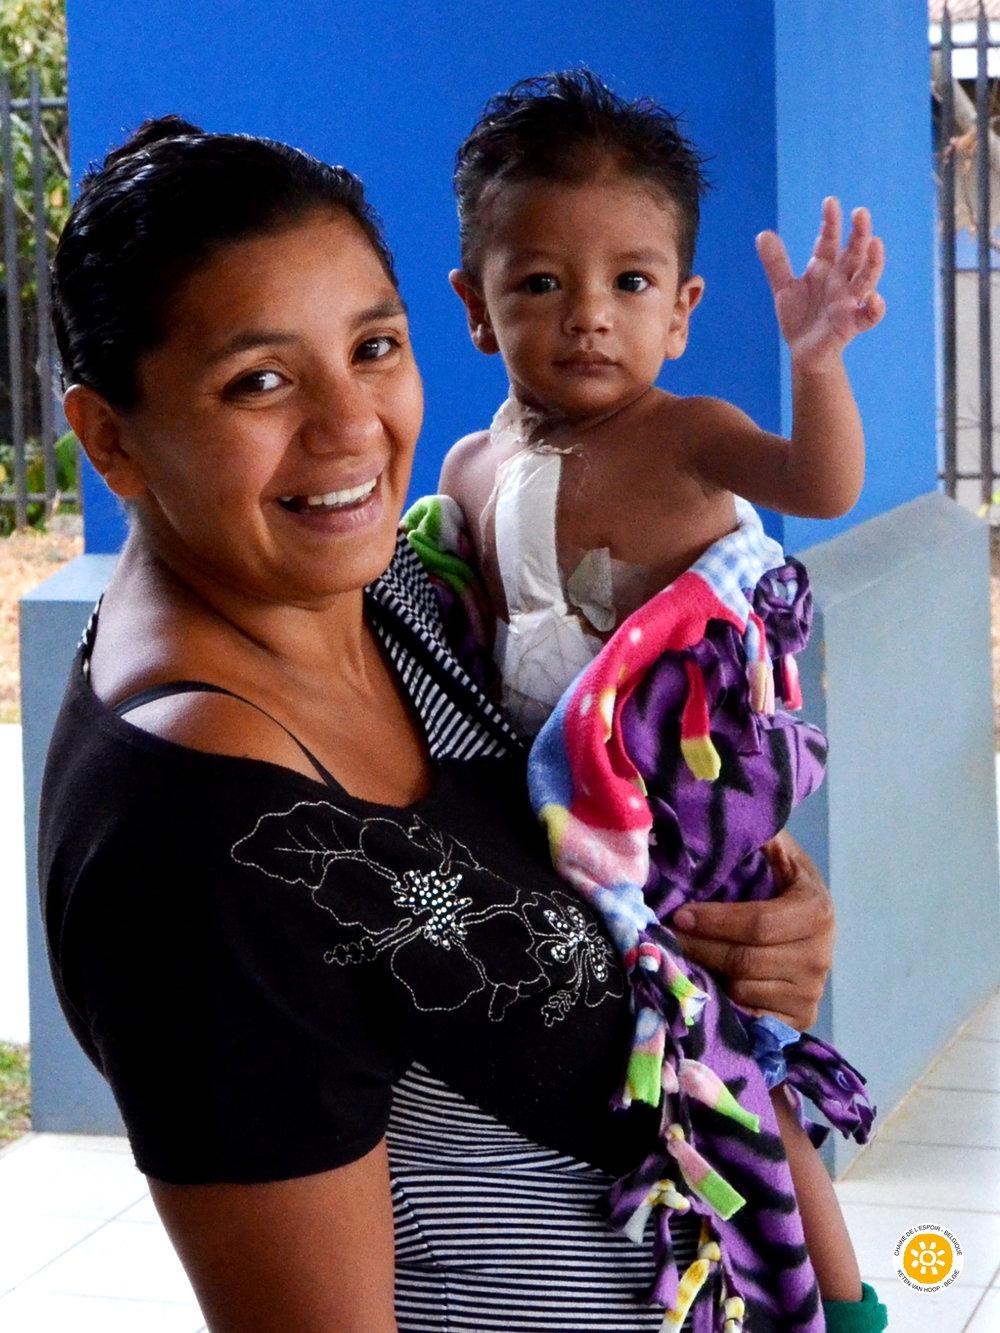 Nicaragua_2014 (2).jpg